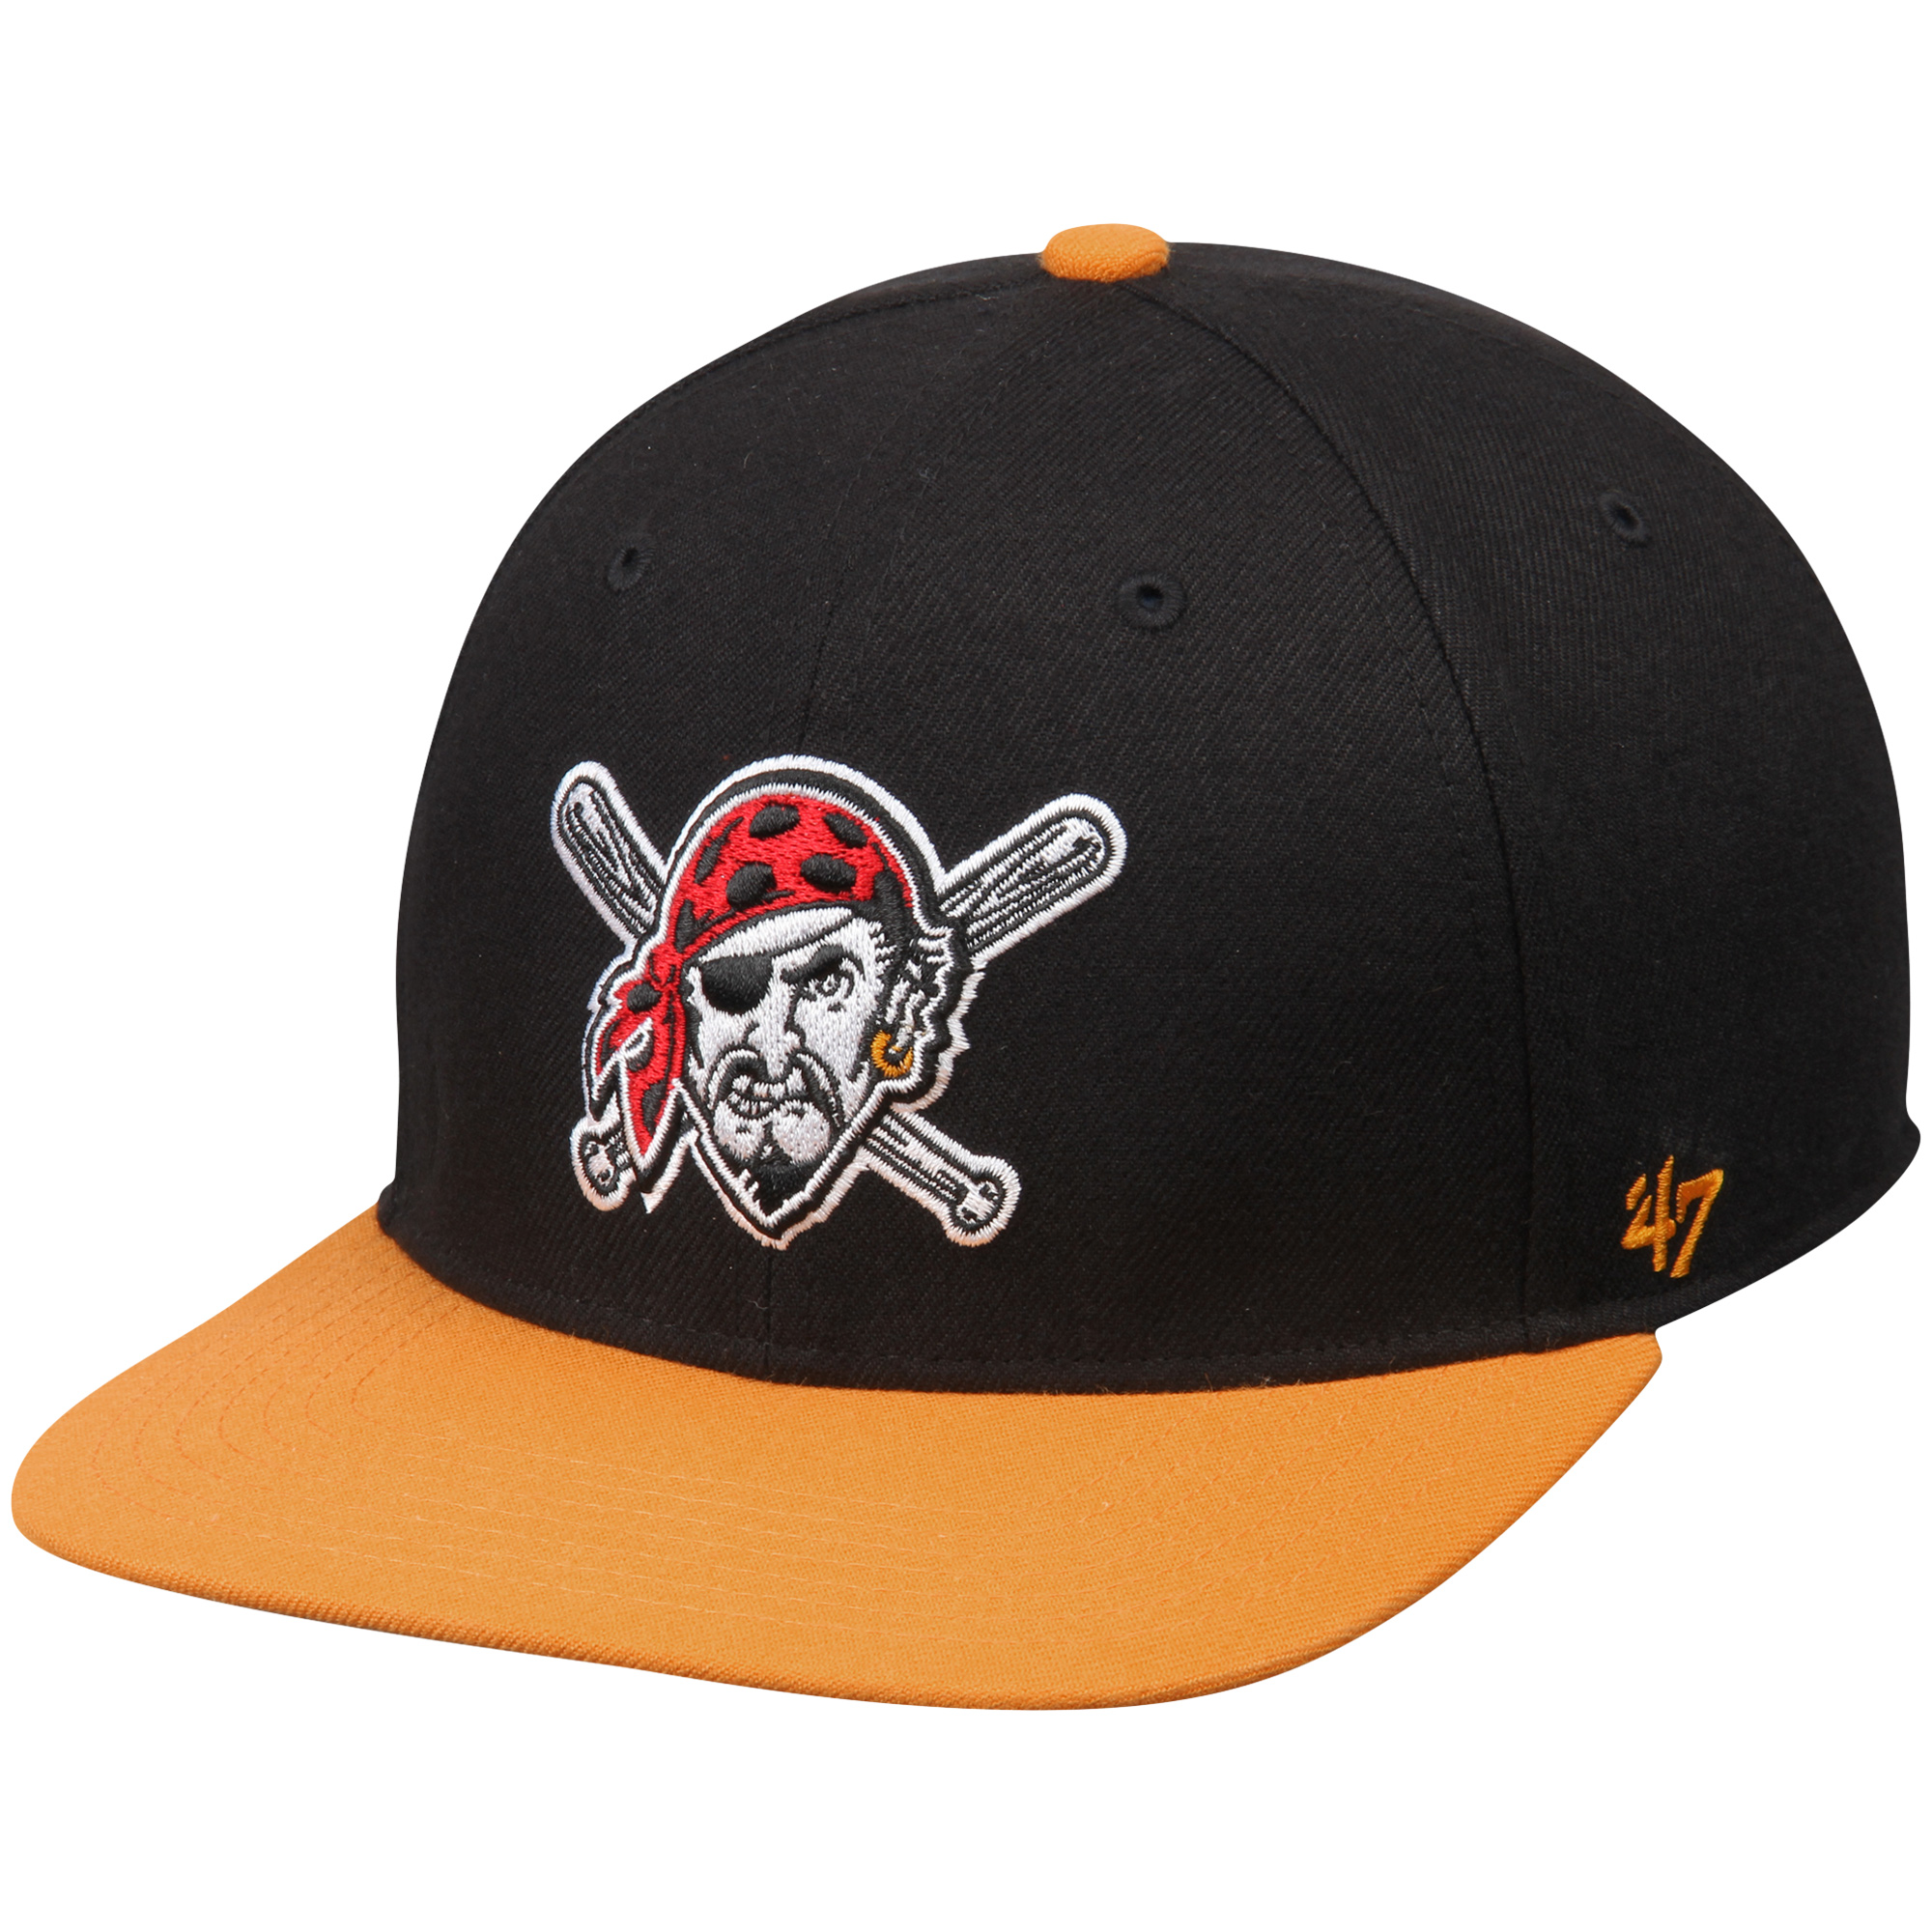 30ea50aea6008 Pittsburgh Pirates  47 Sure Shot Two-Tone Snapback Adjustable Hat - Black Gold  - OSFA - Walmart.com